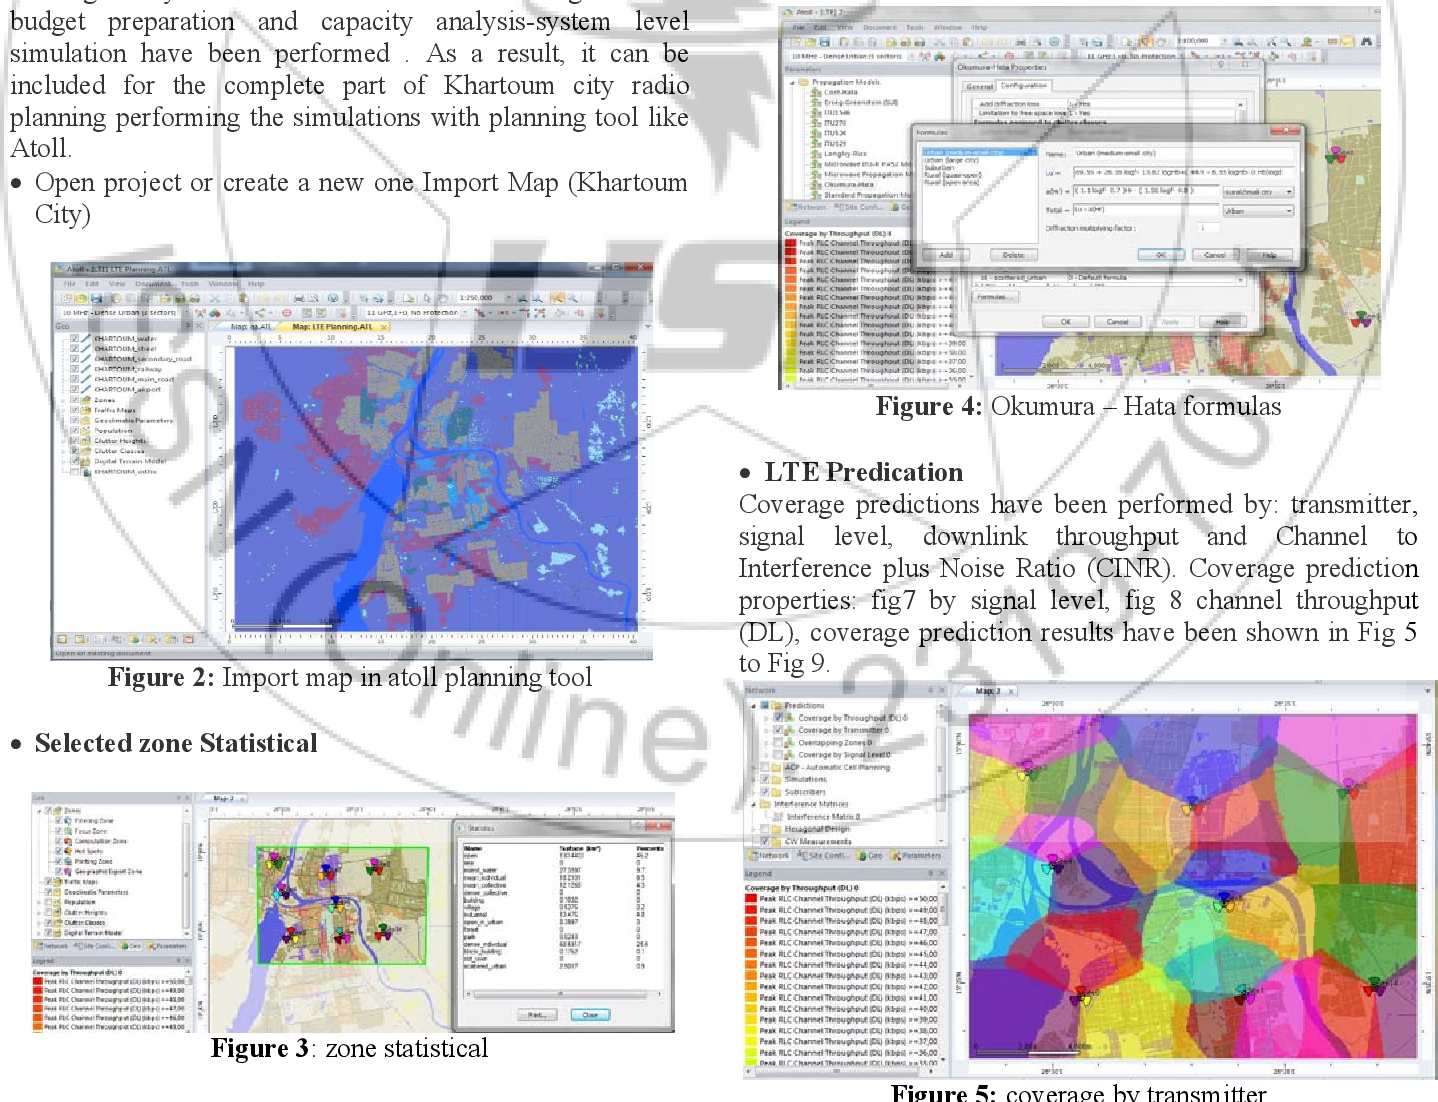 PDF] LTE Radio Planning Using Atoll Radio Planning and